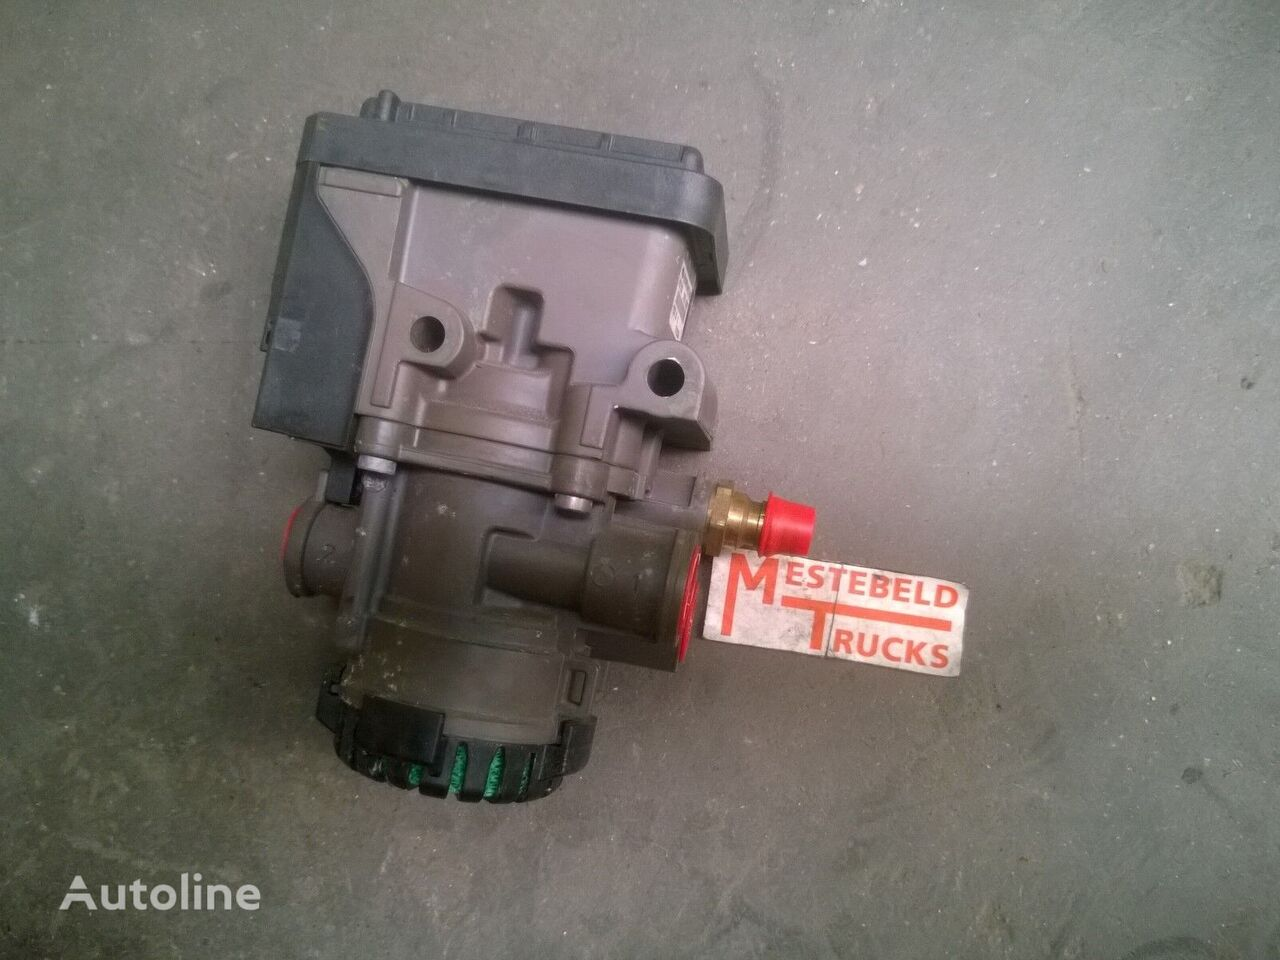 EBS Voorasmodulator spare parts for RENAULT EBS Voorasmodulator truck